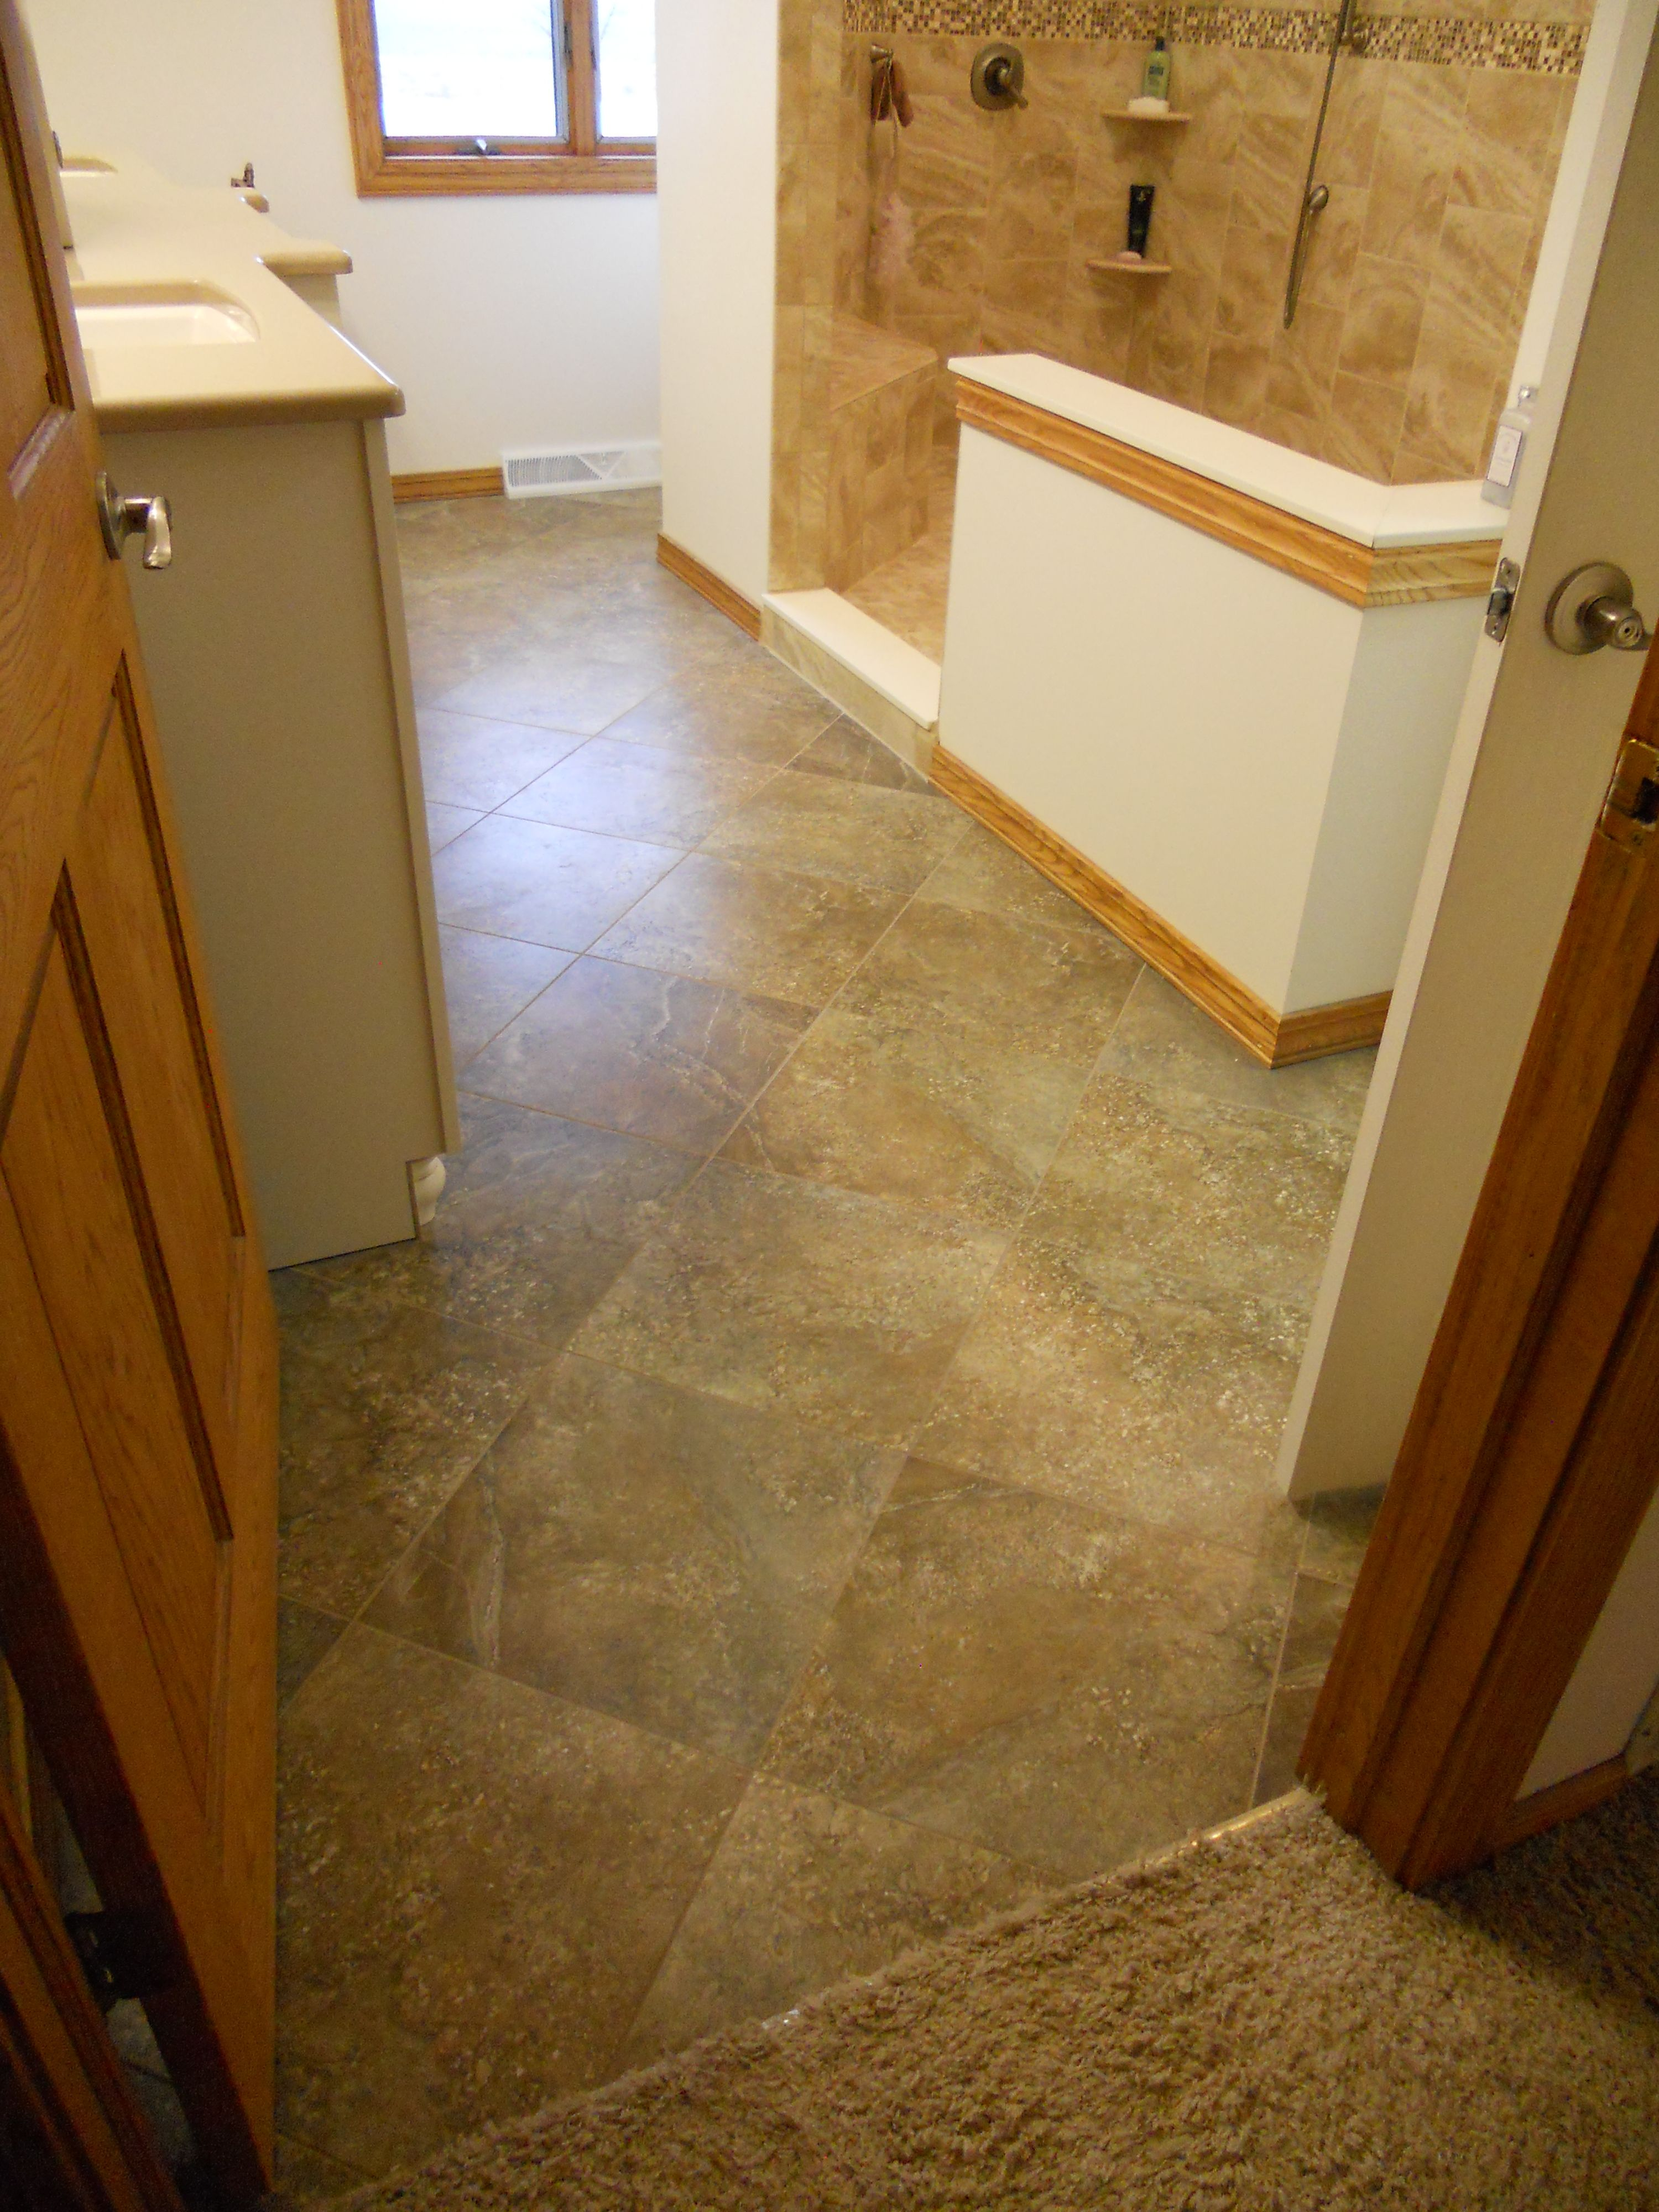 mannington s adura luxury vinyl tile luxury vinyl tile vinyl tile bathrooms remodel on kitchen remodel vinyl flooring id=91394